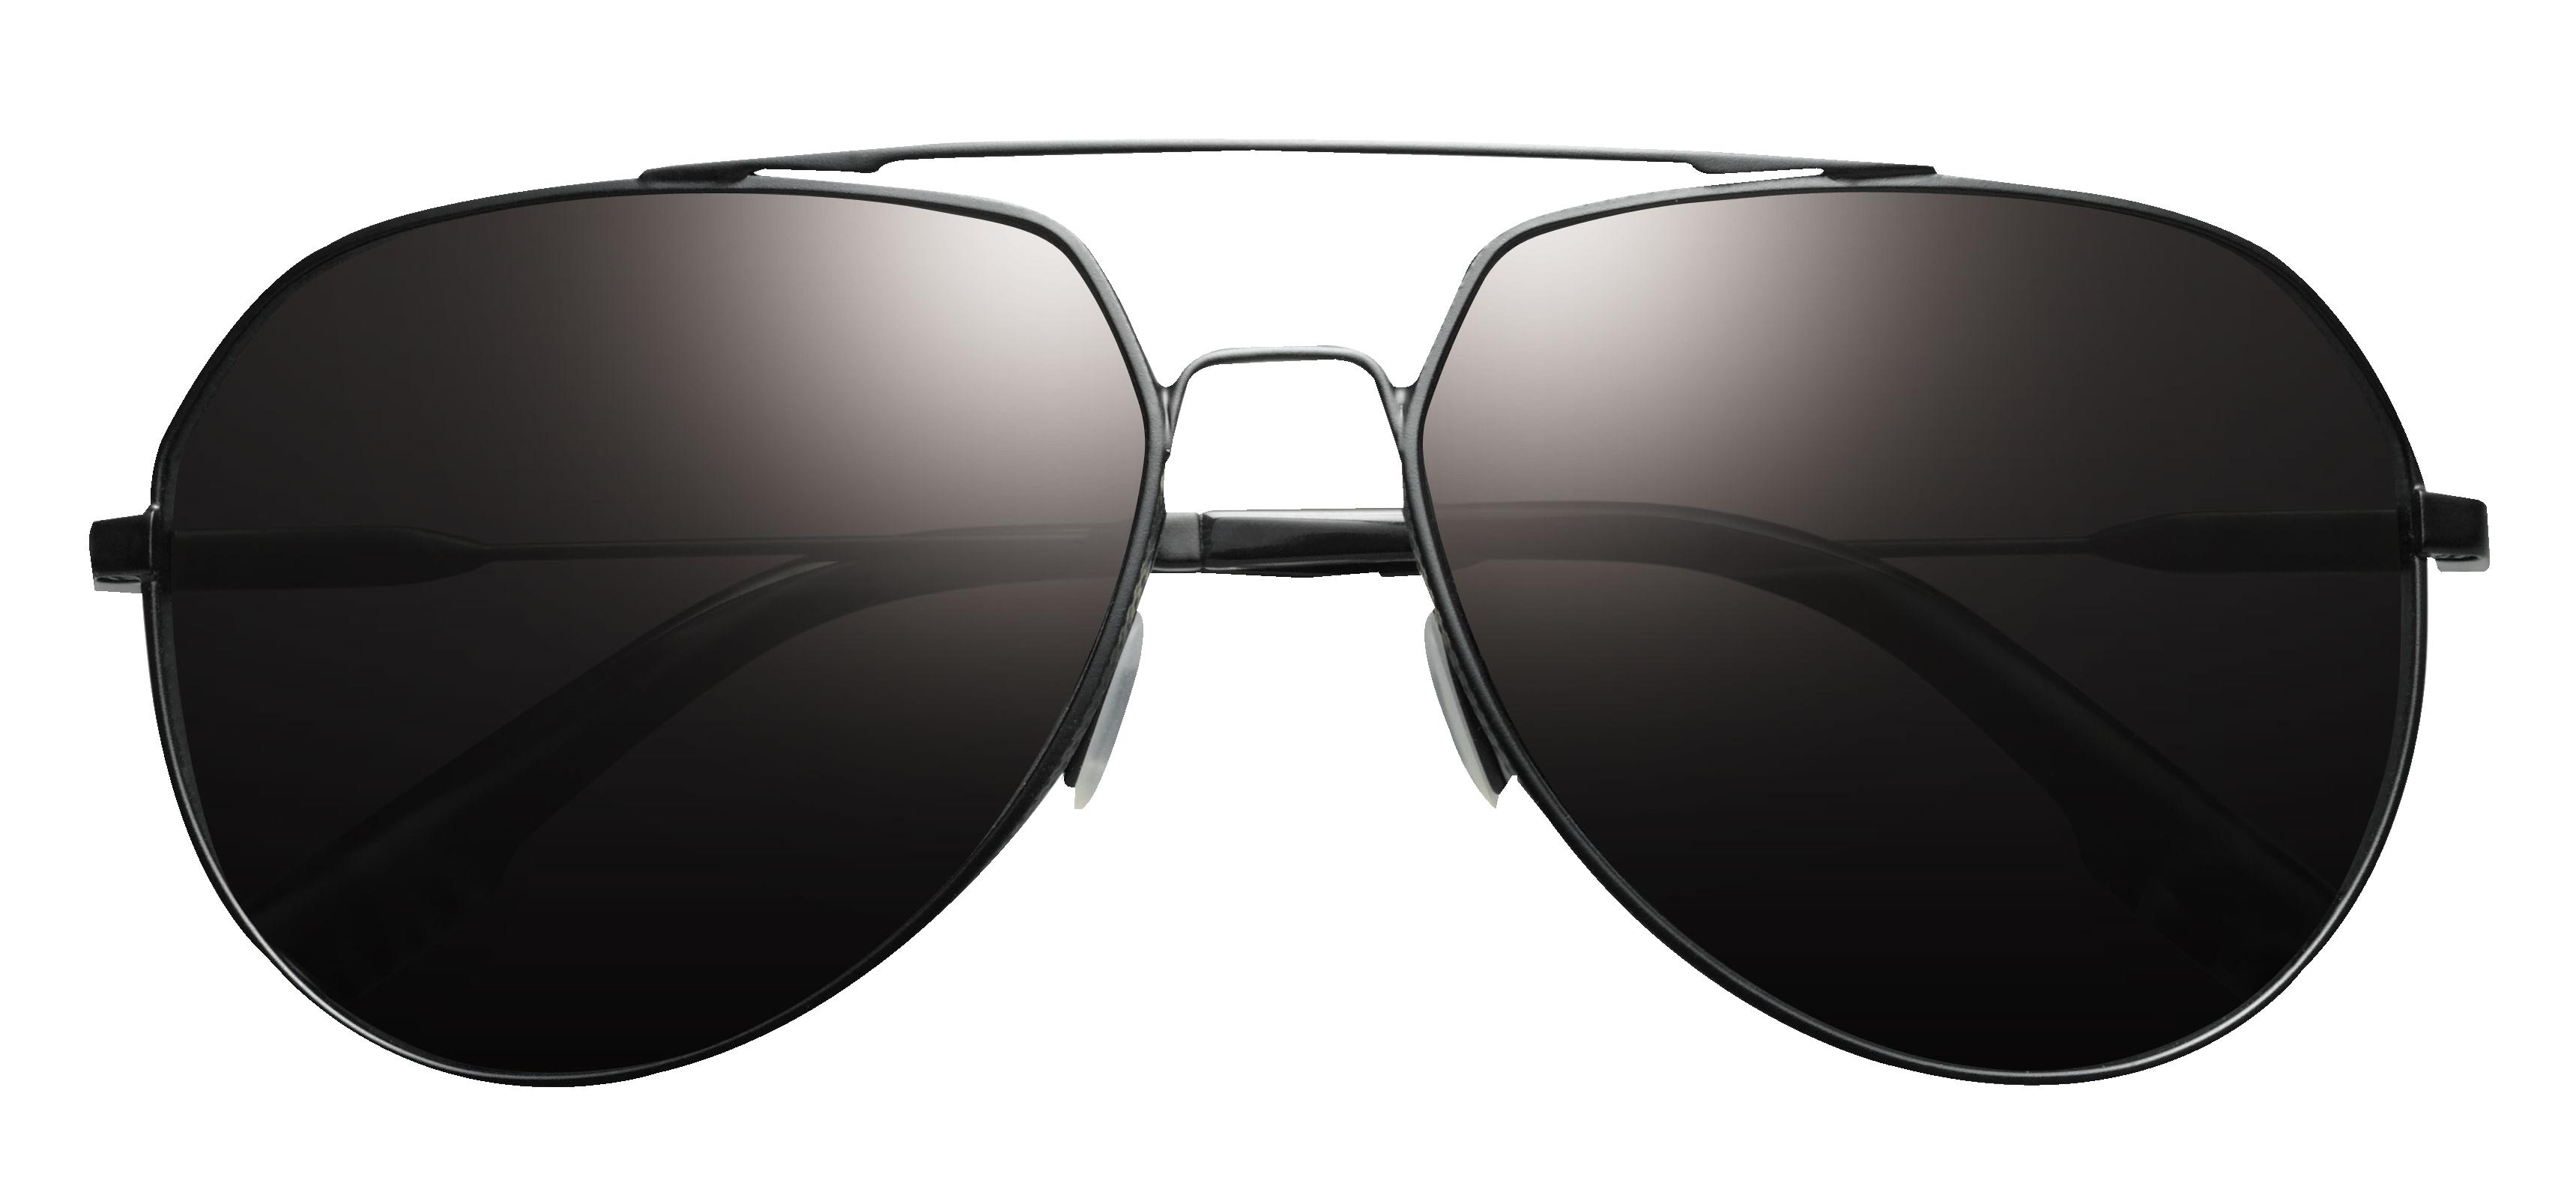 Sunglasses clipart sun glass. Sunglass png image purepng